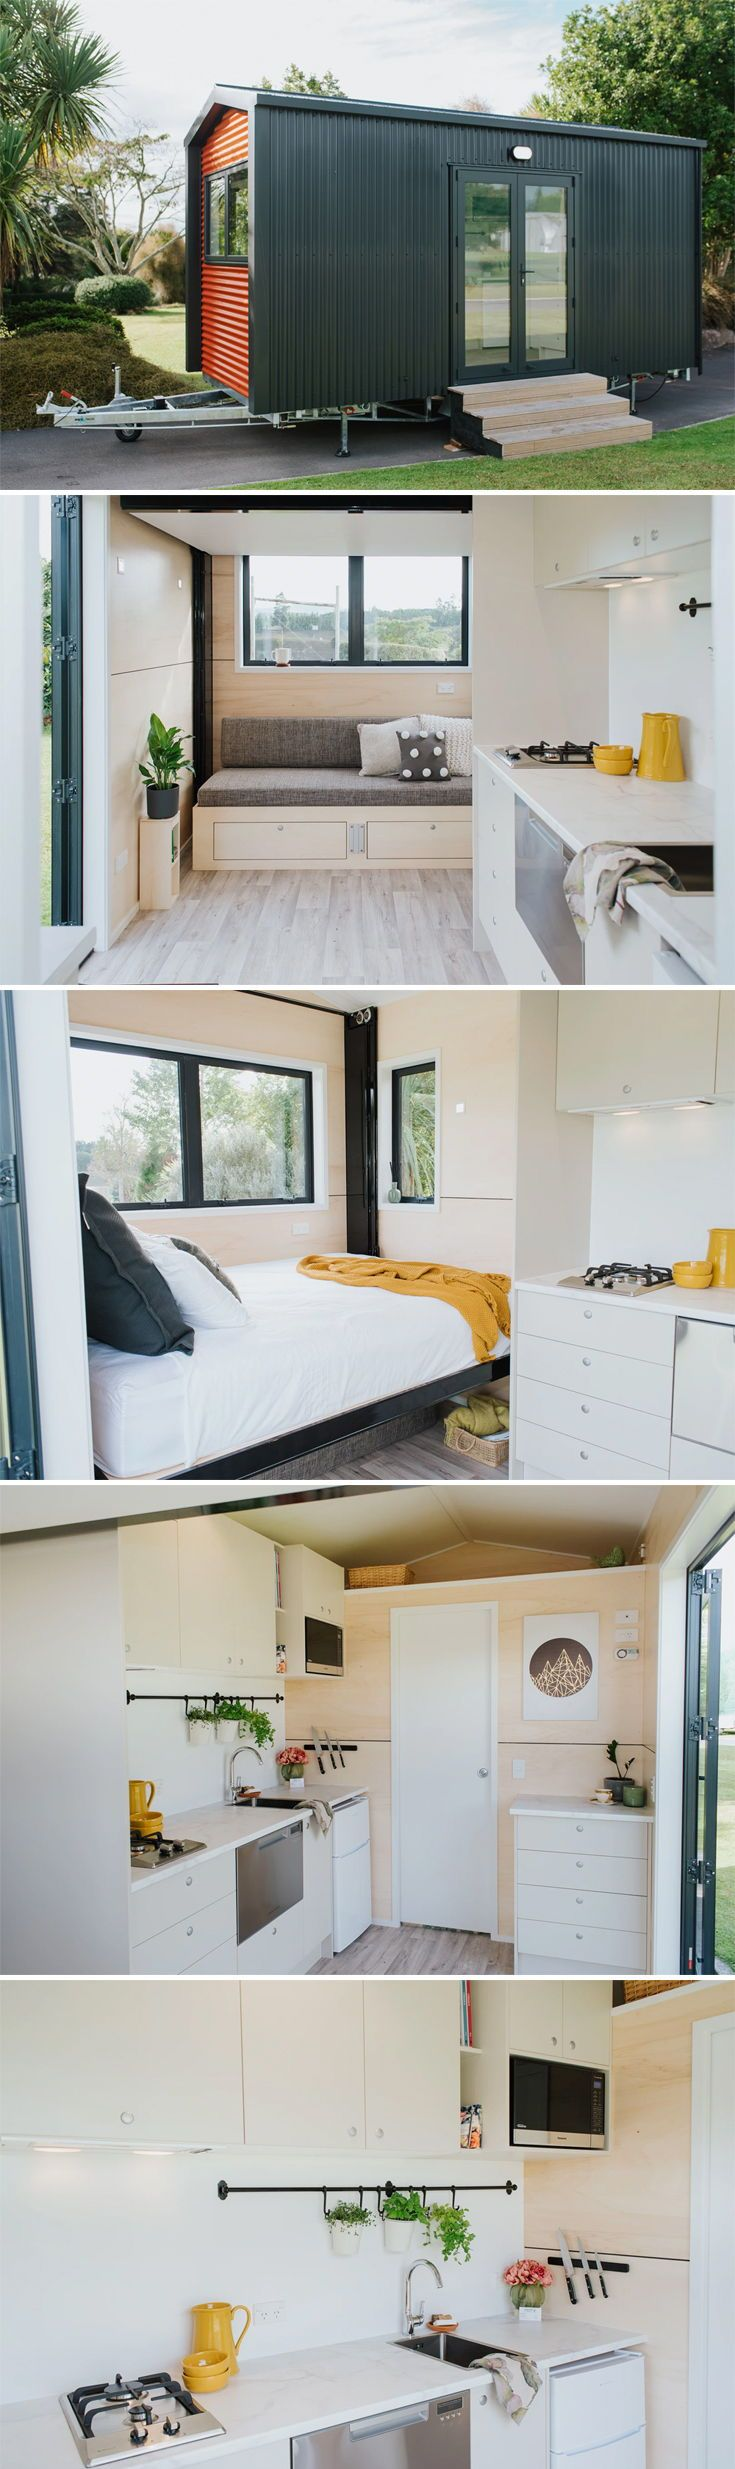 Photo of Camper Tiny House di Build Tiny – Tiny Living